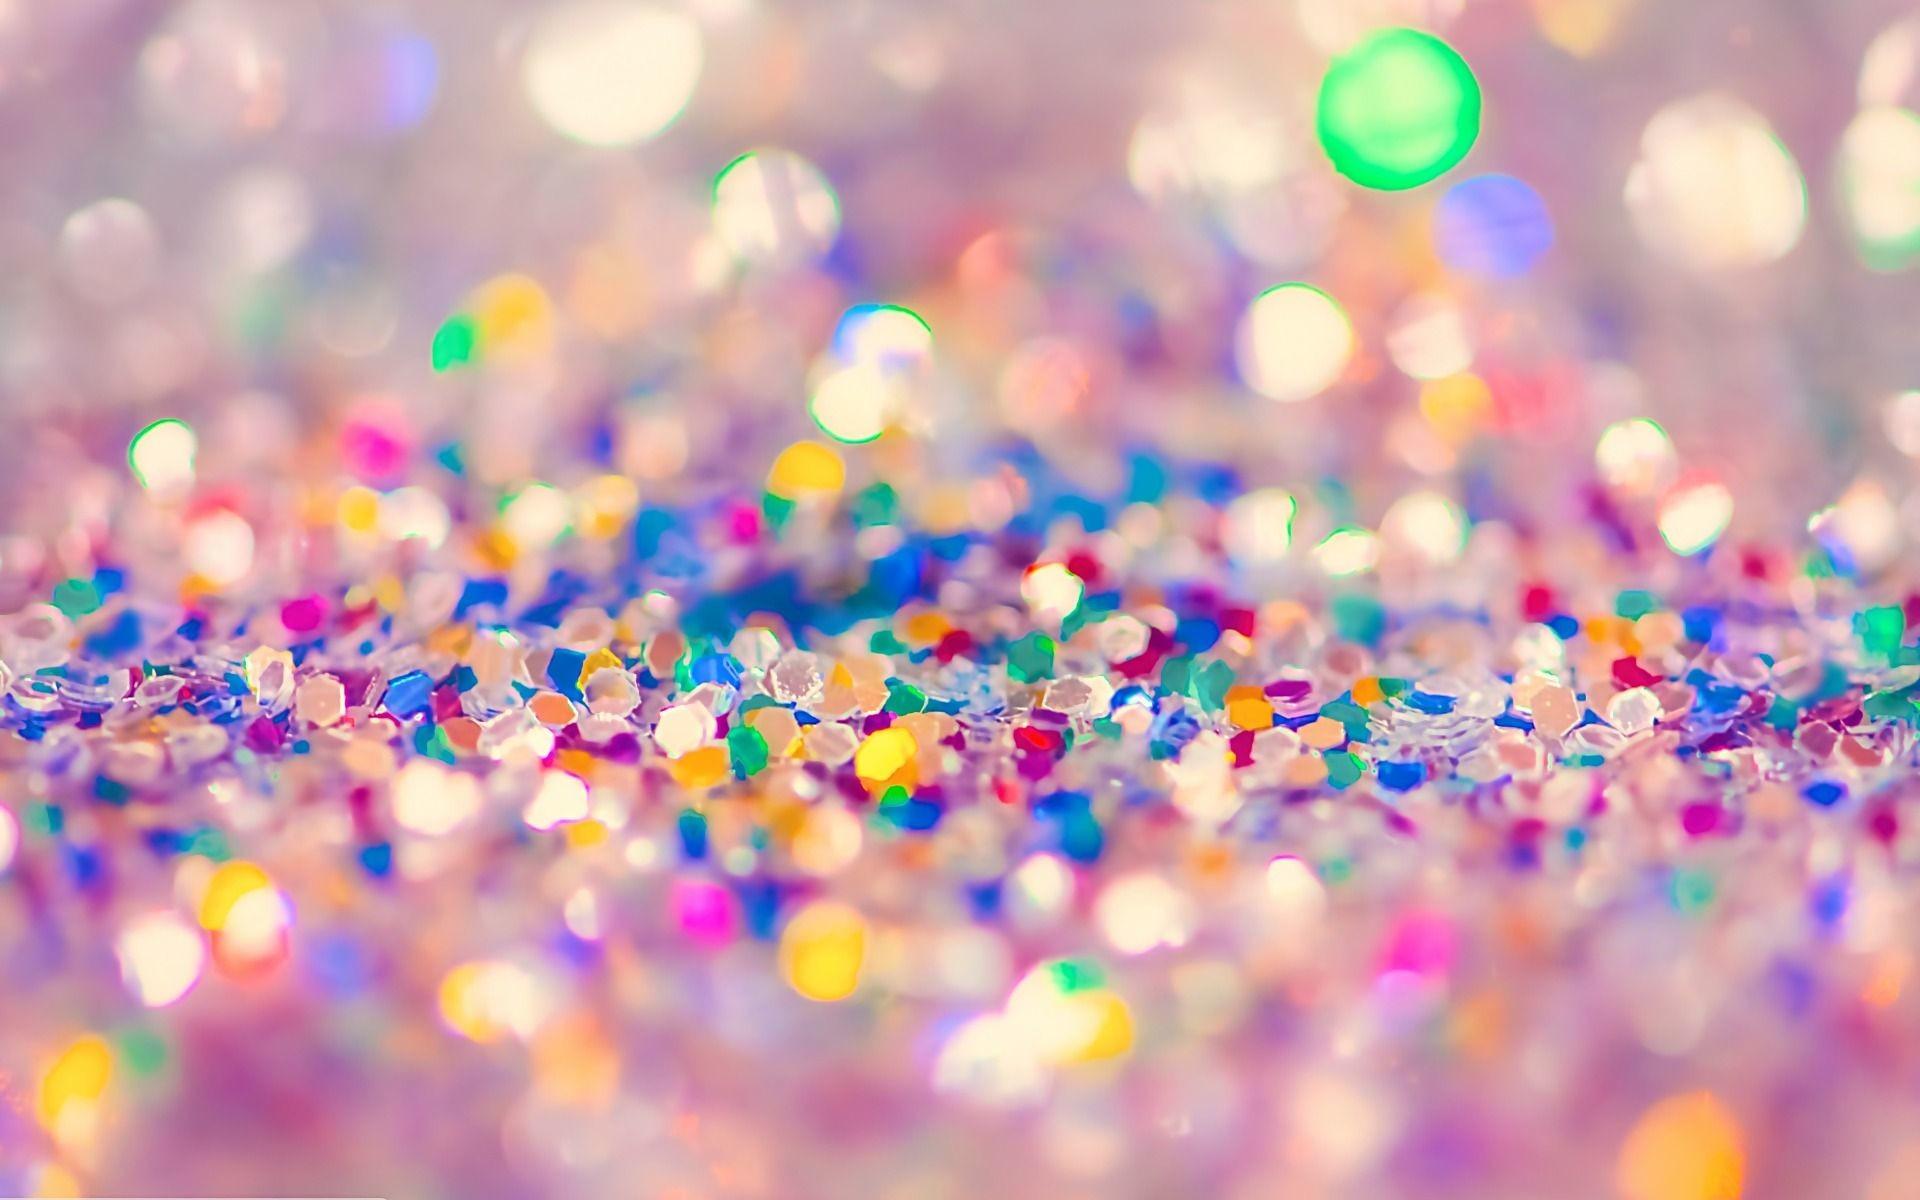 Explore Silver Glitter, Desktop Backgrounds and more!